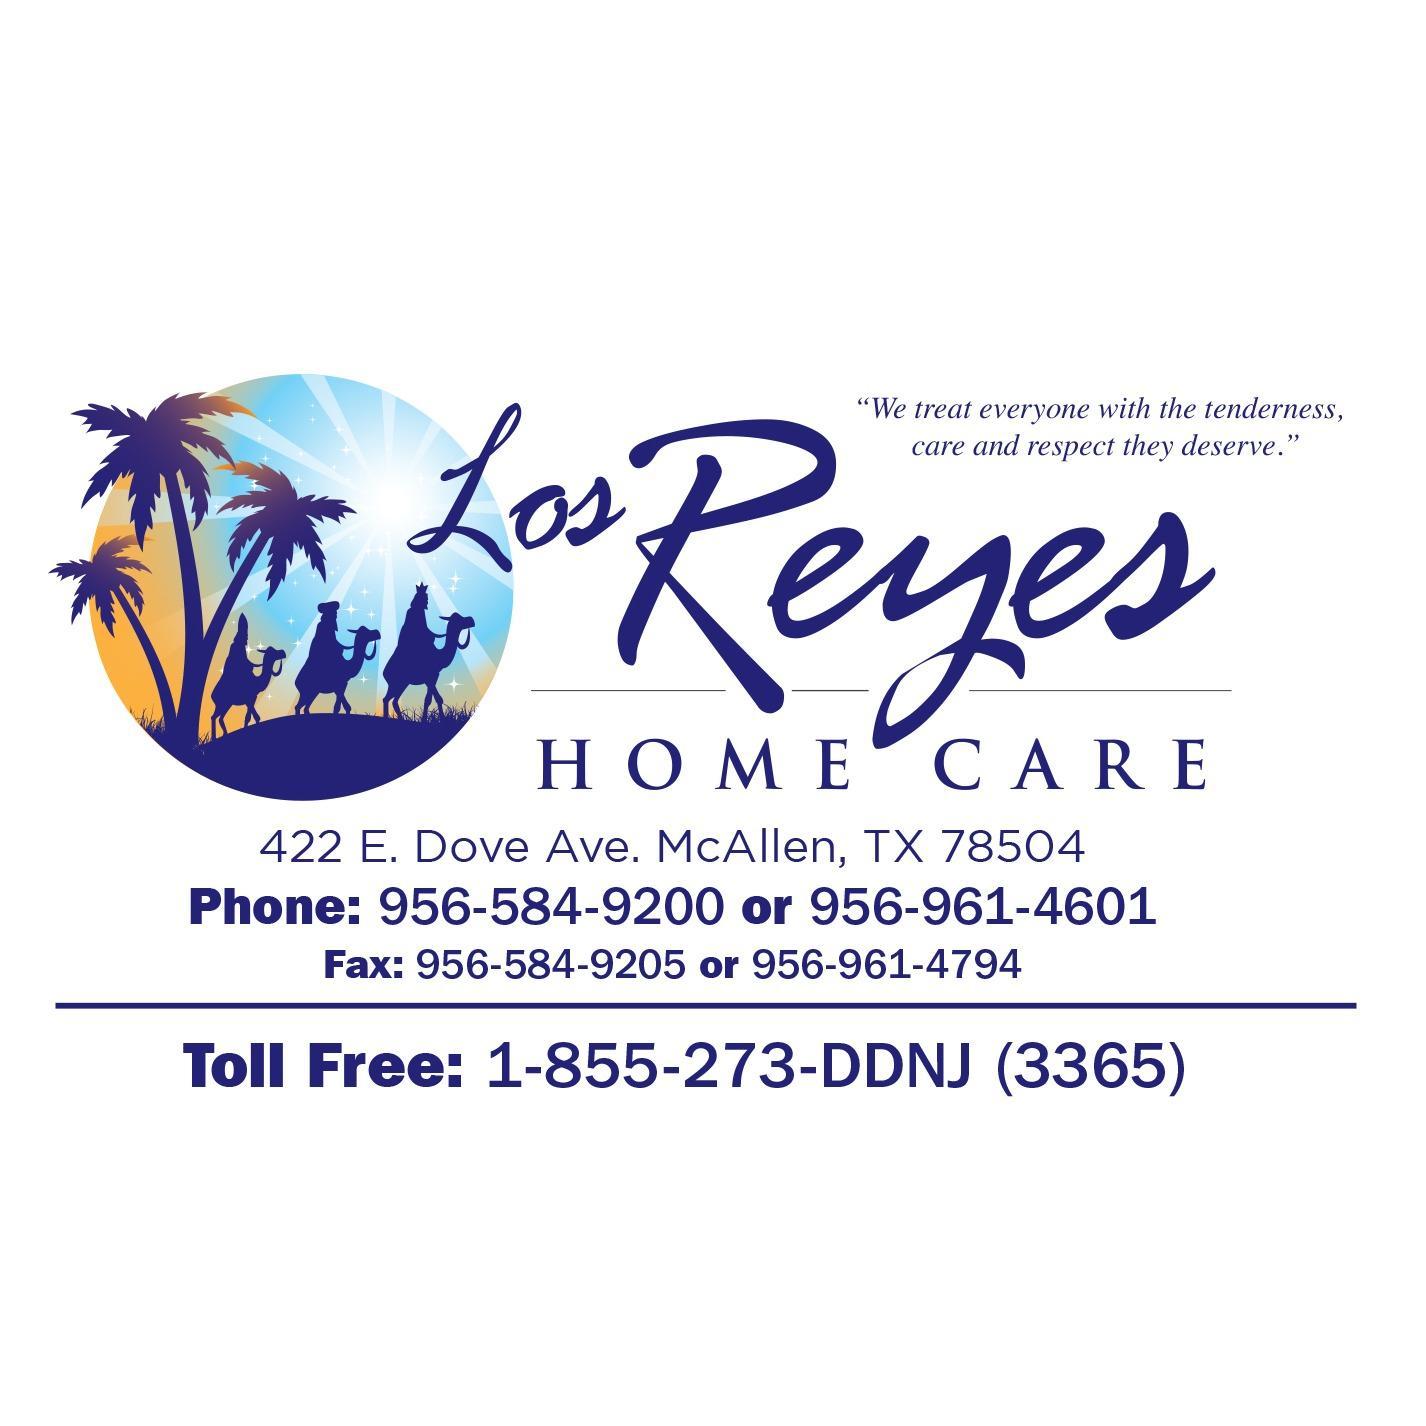 Los Reyes Home Care